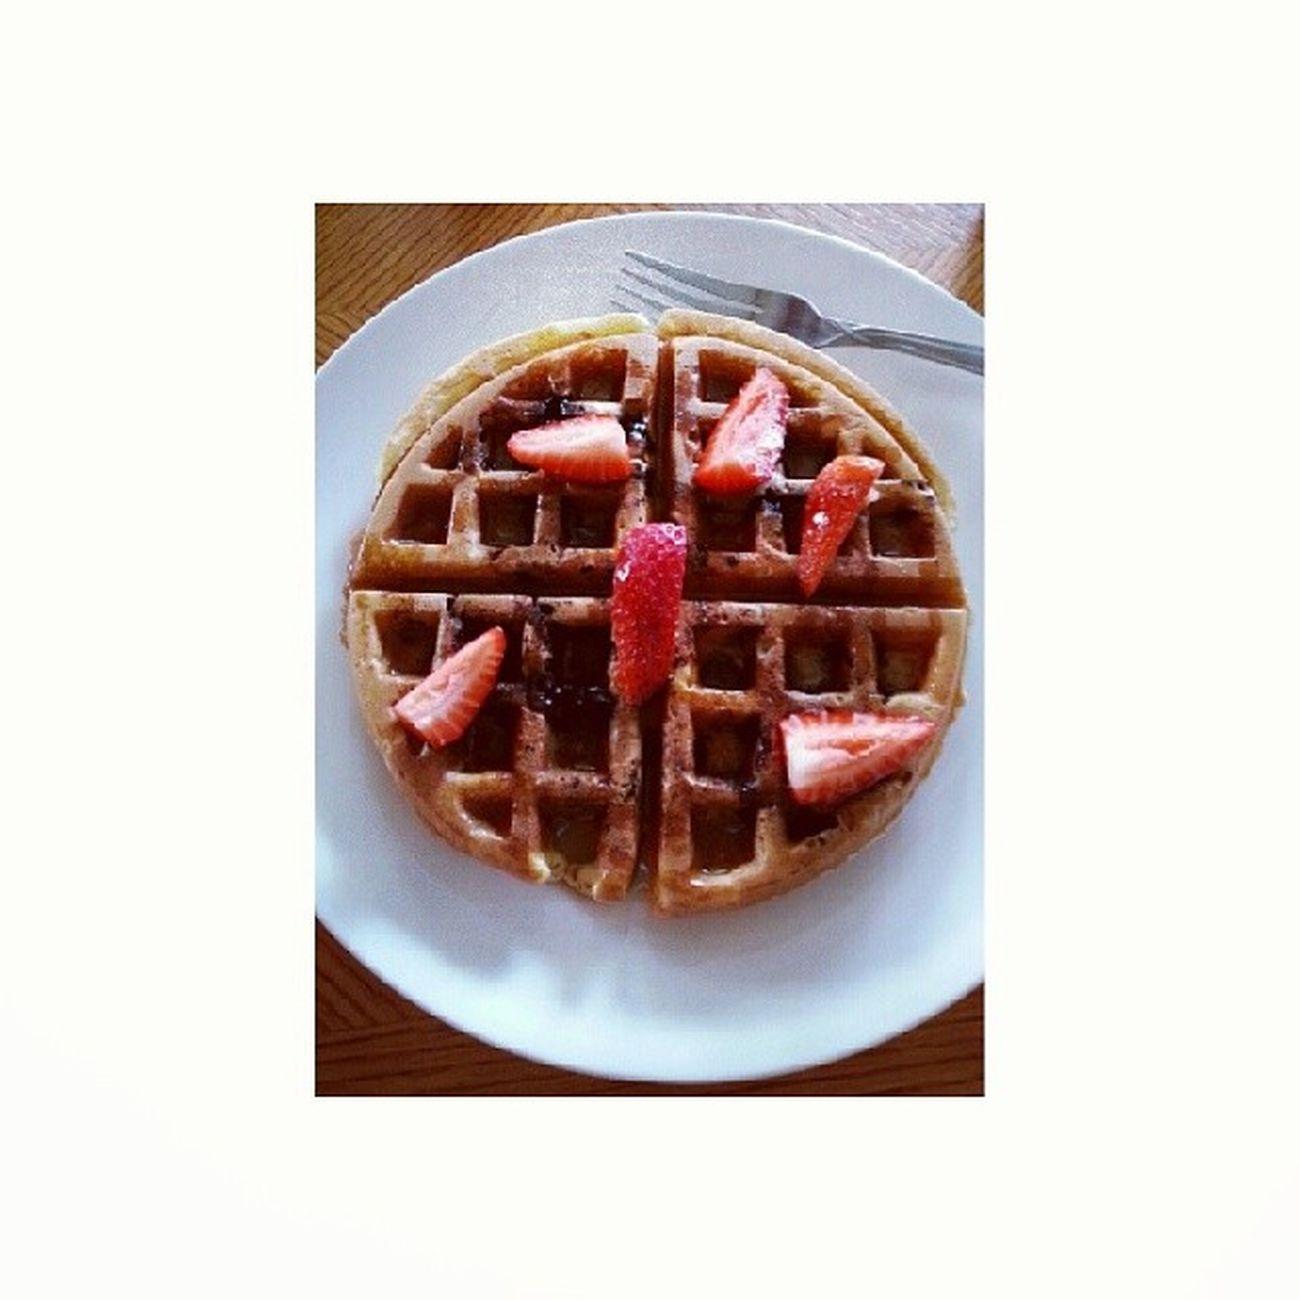 blueberry waffles Wafflesoverpancakes